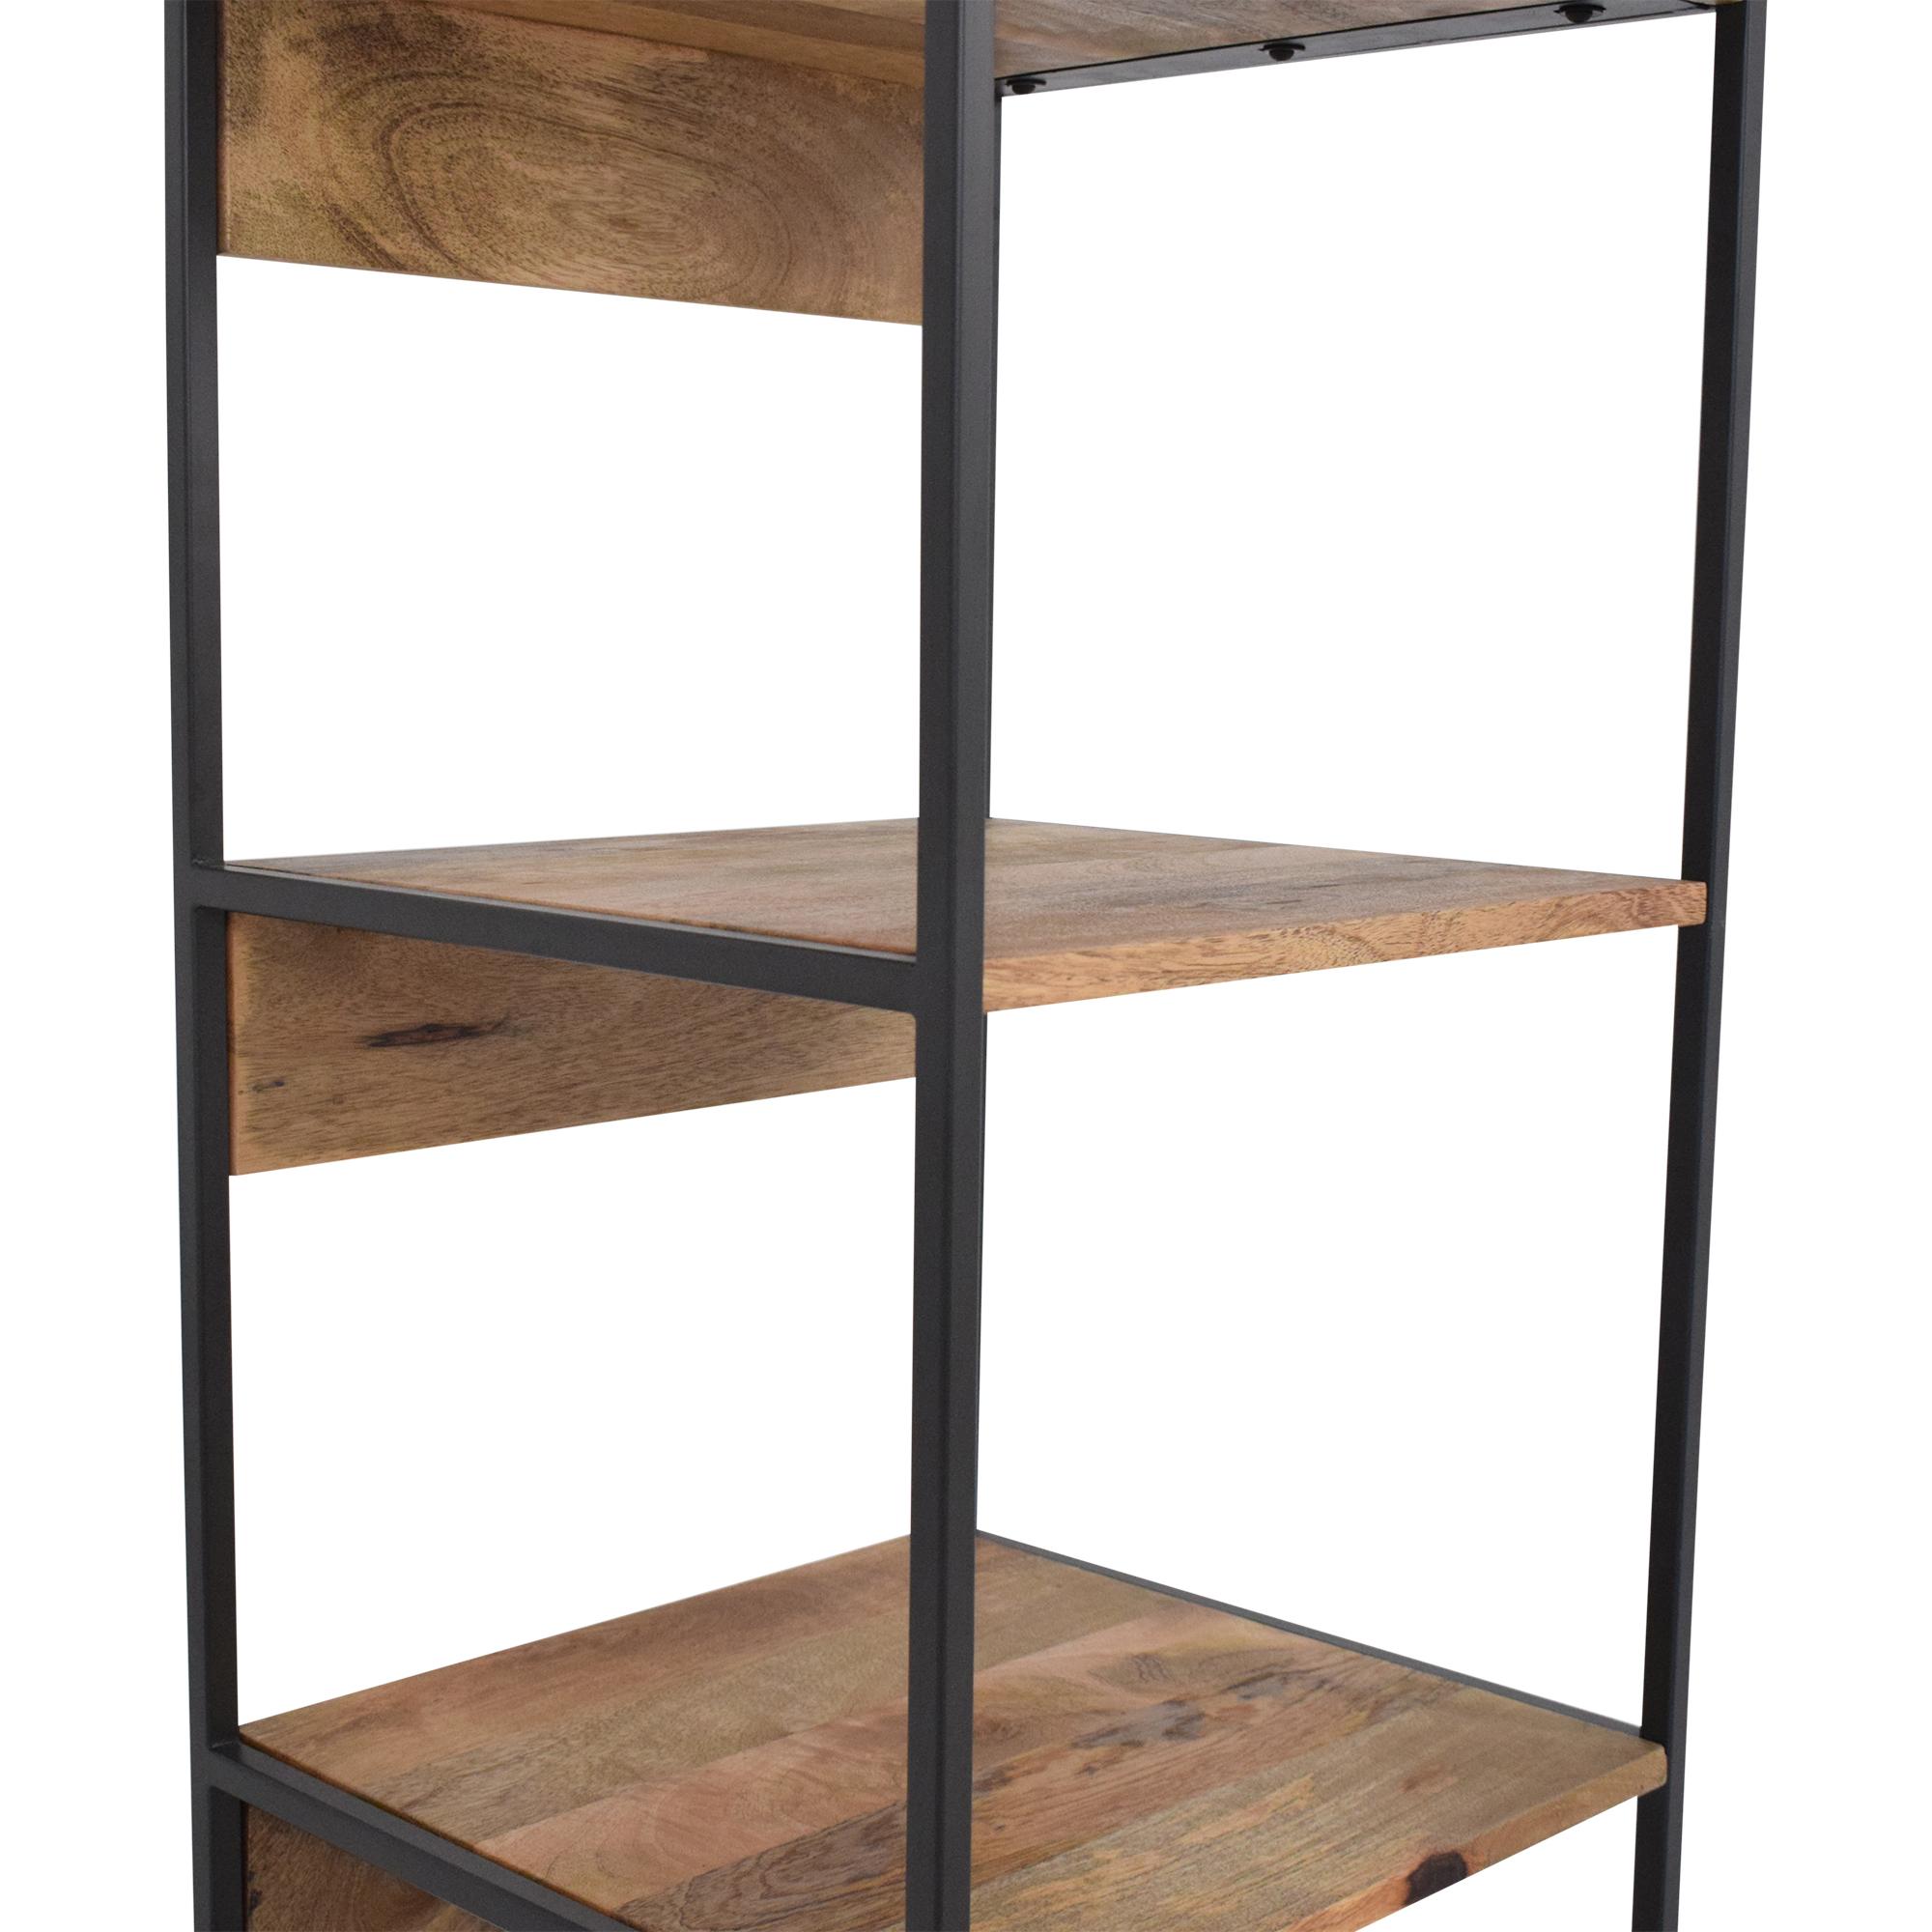 West Elm West Elm Industrial Modular Bookshelf used